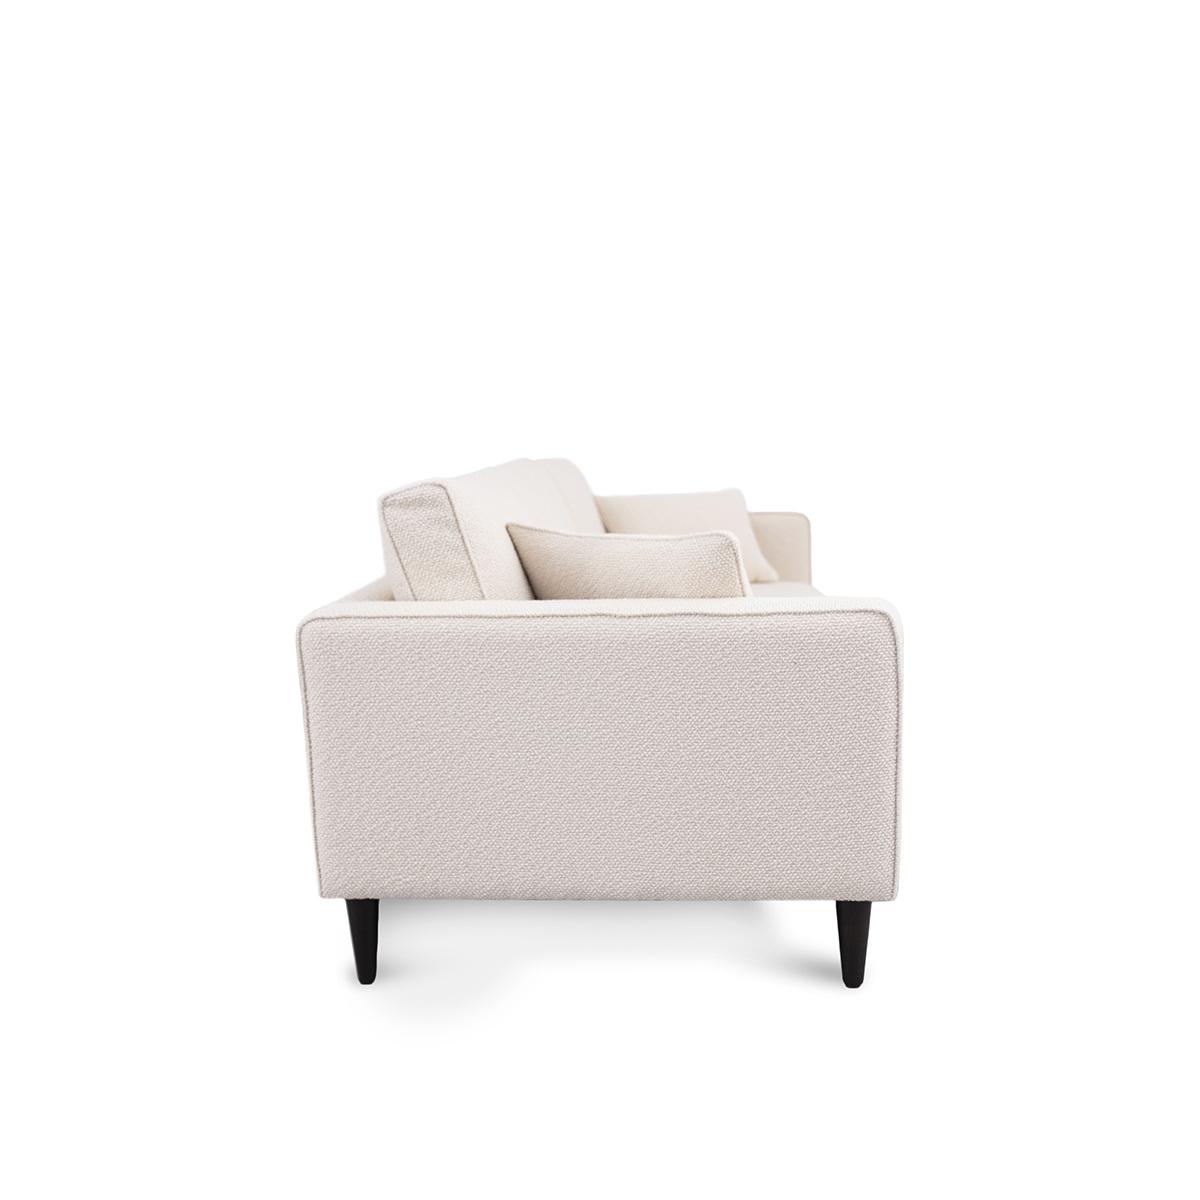 Noa Sofa